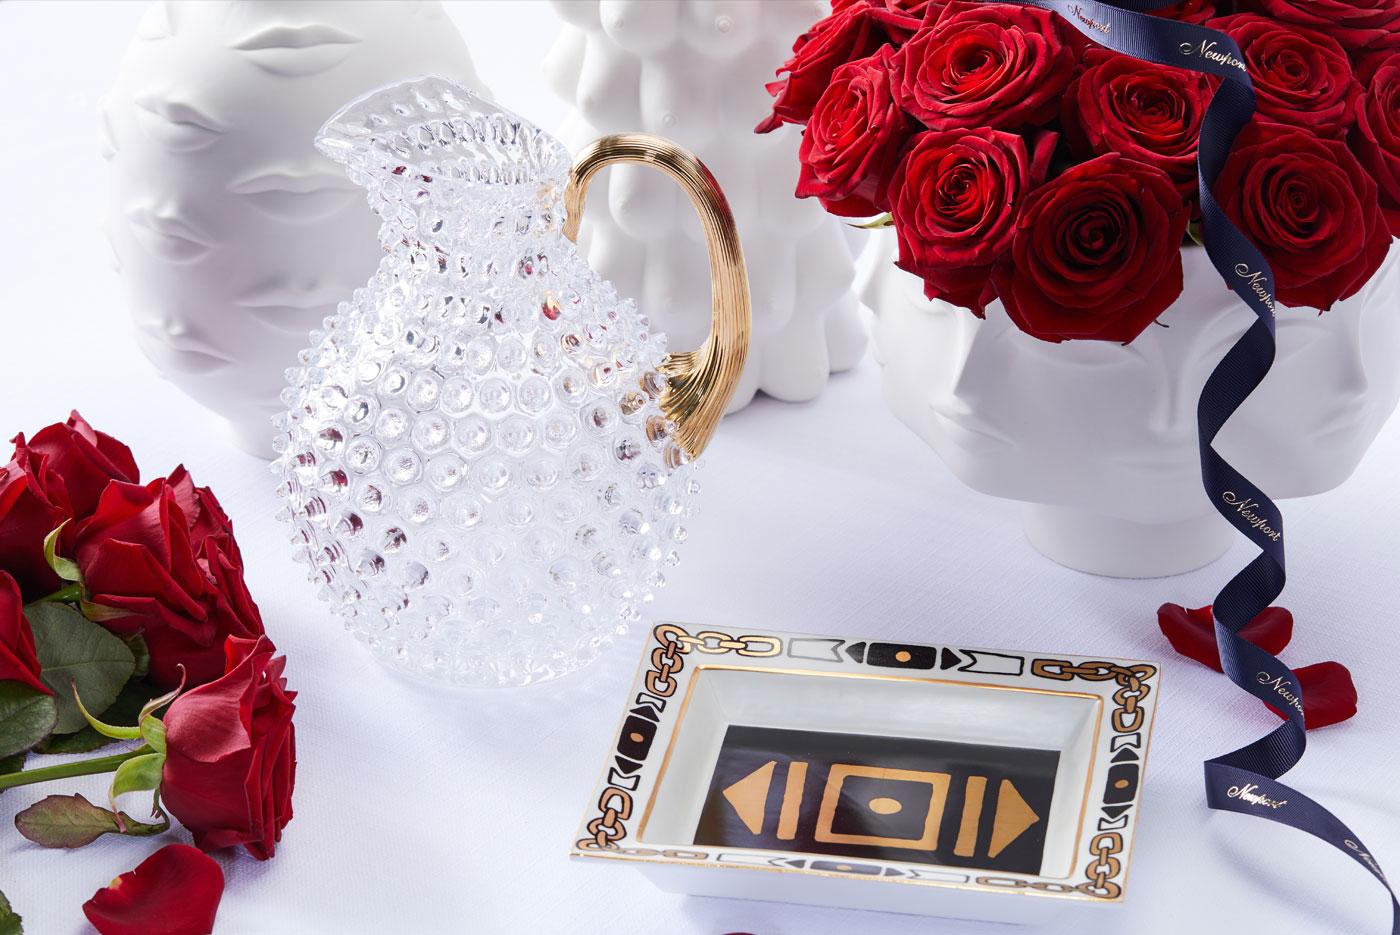 Valentines-helbild-karaff